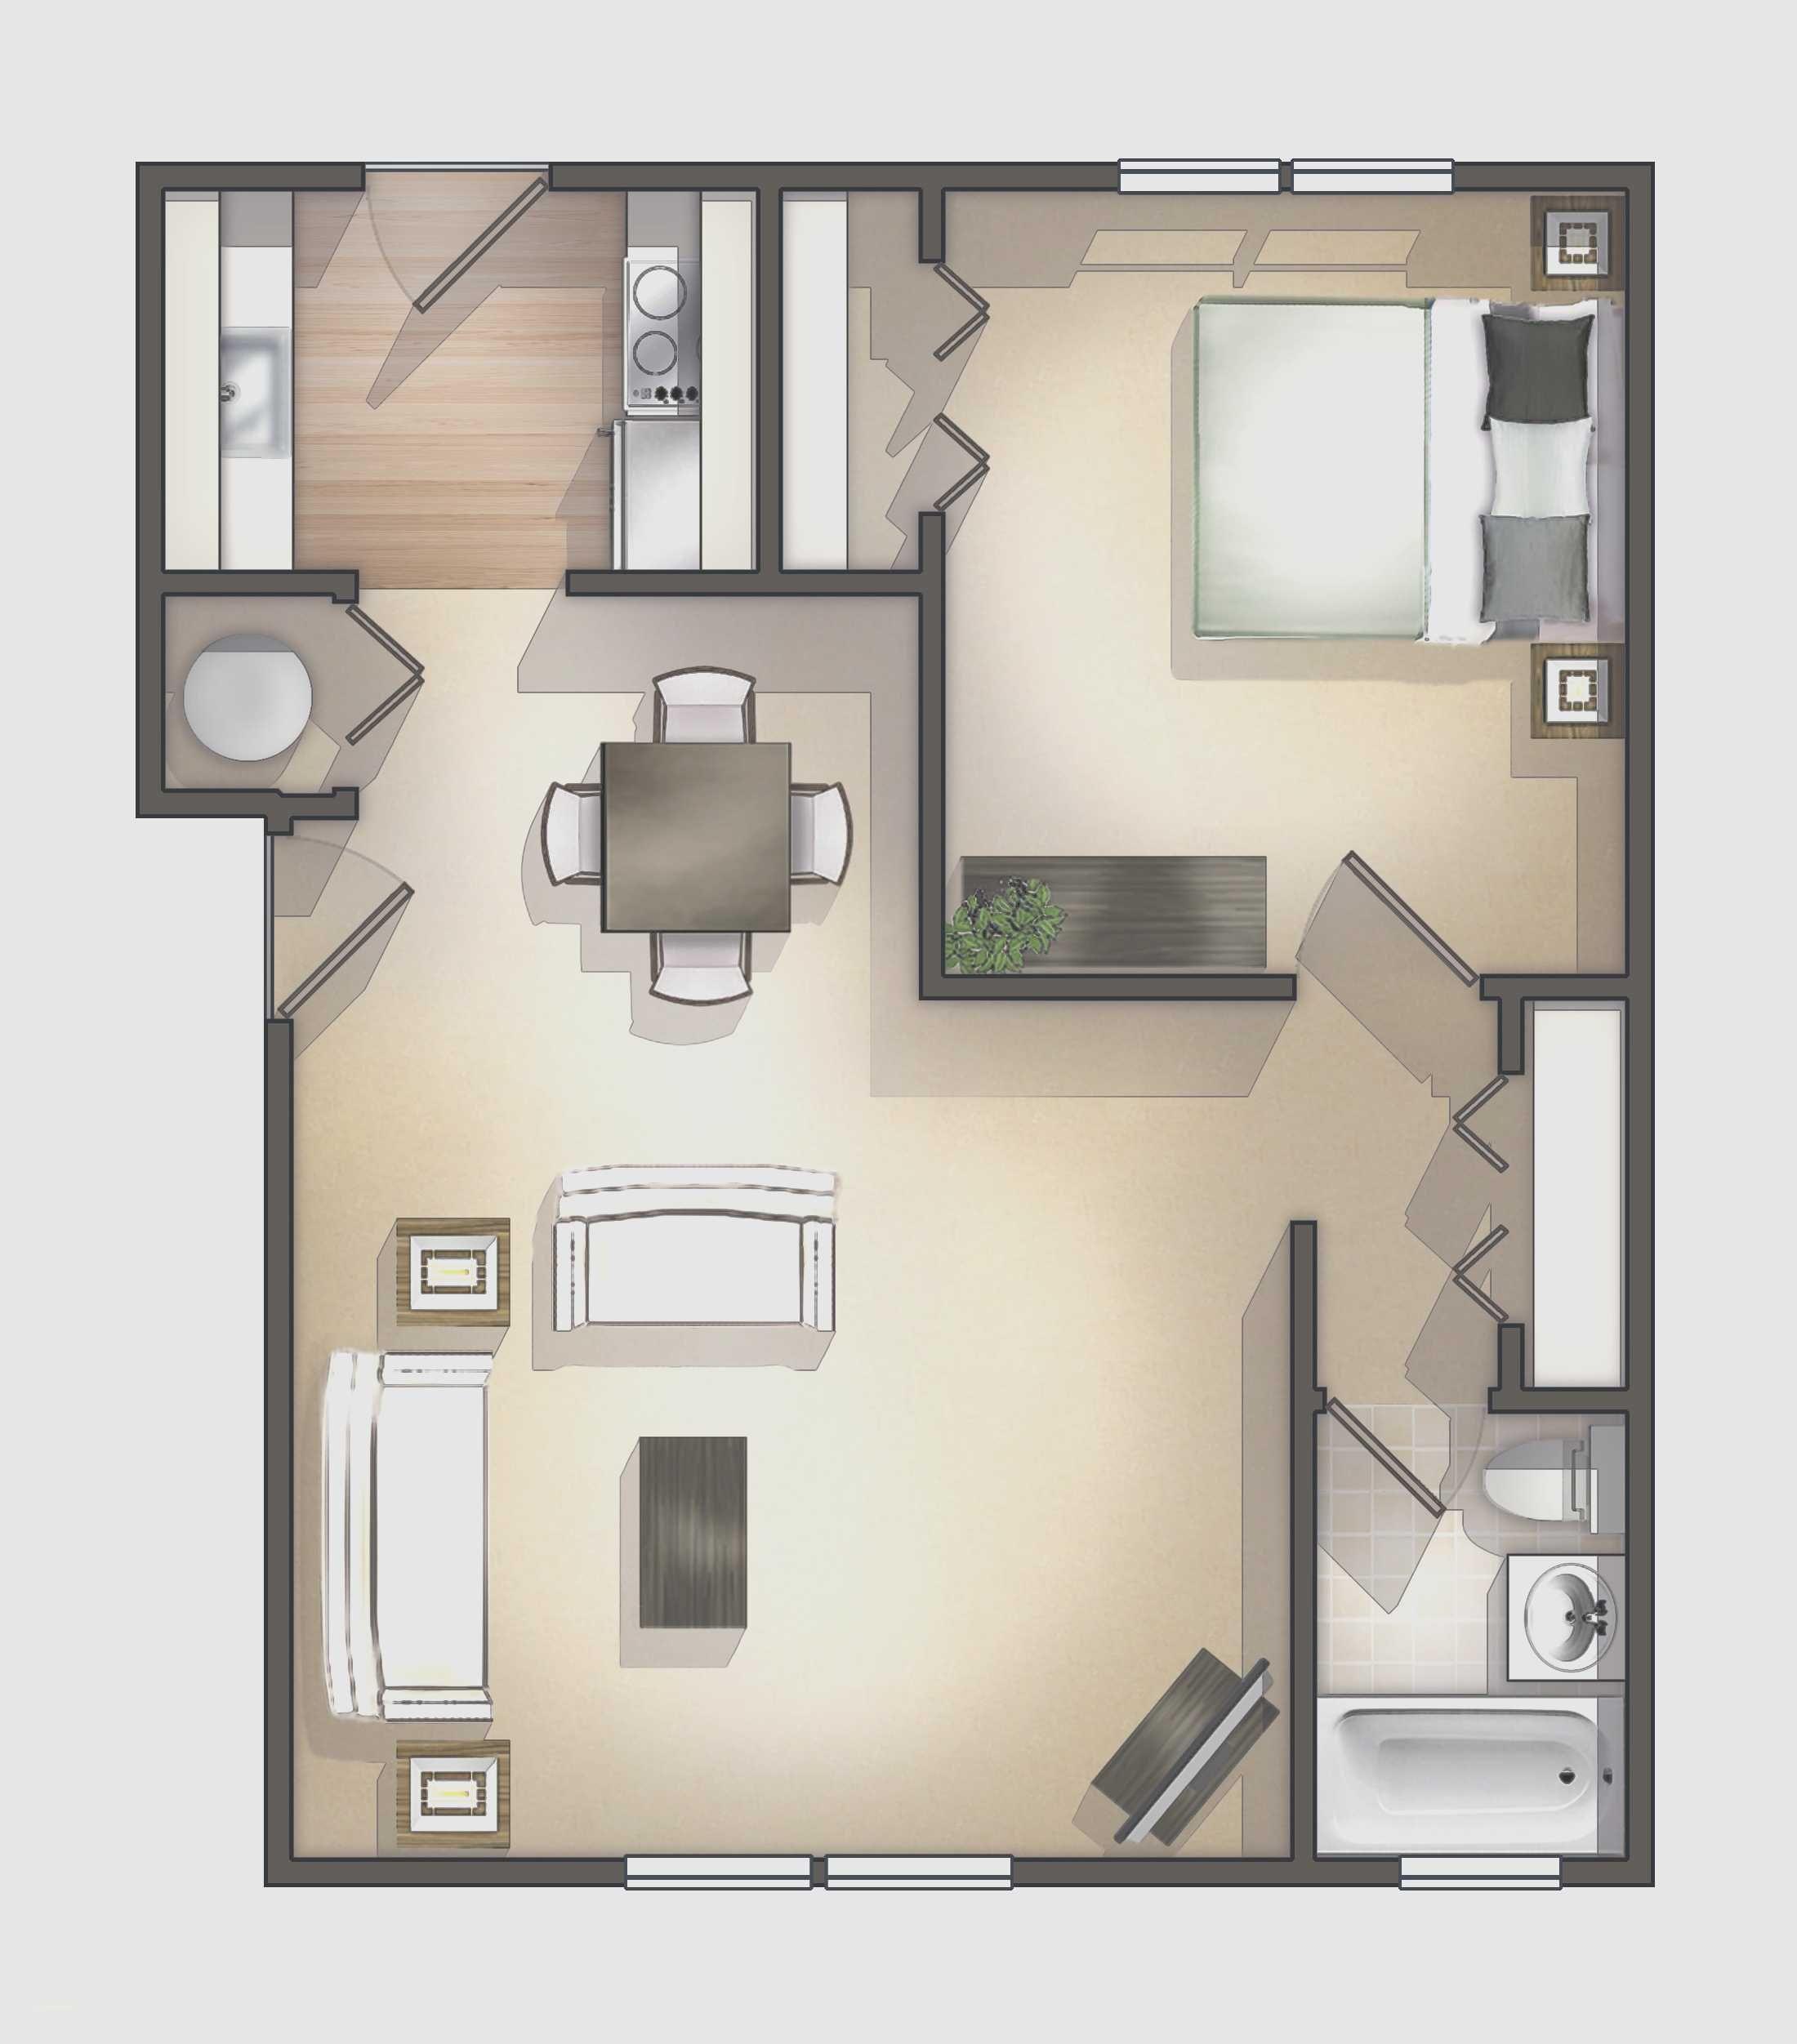 Inspirational 1 bedroom apartment design plans bedroom - 1 bedroom apartments in portsmouth nh ...